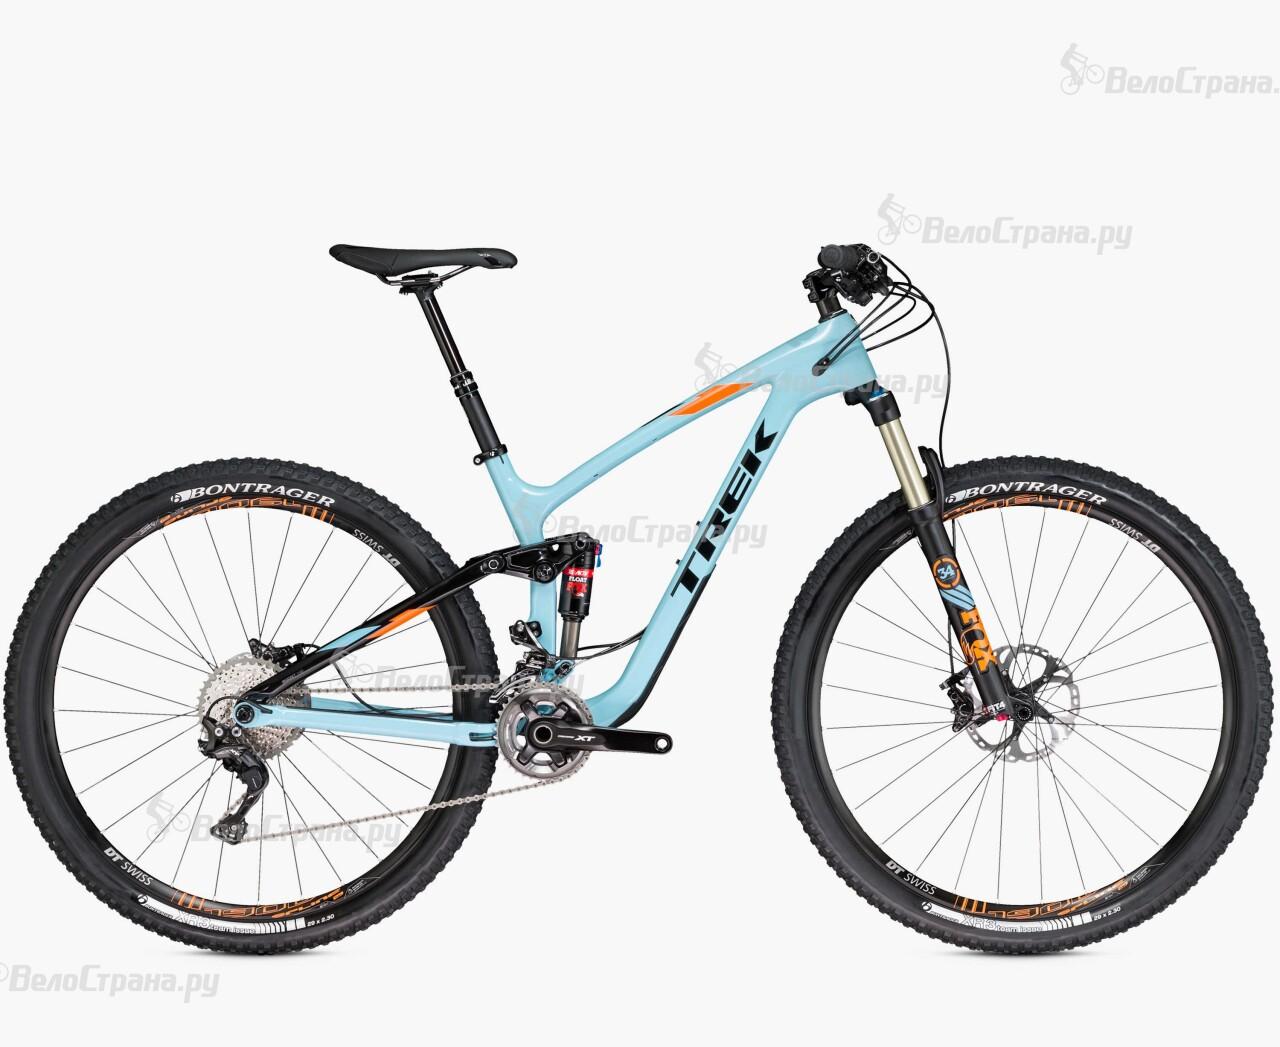 Велосипед Trek Fuel EX 9.8 29 (2016) велосипед trek fuel ex 9 29 2017